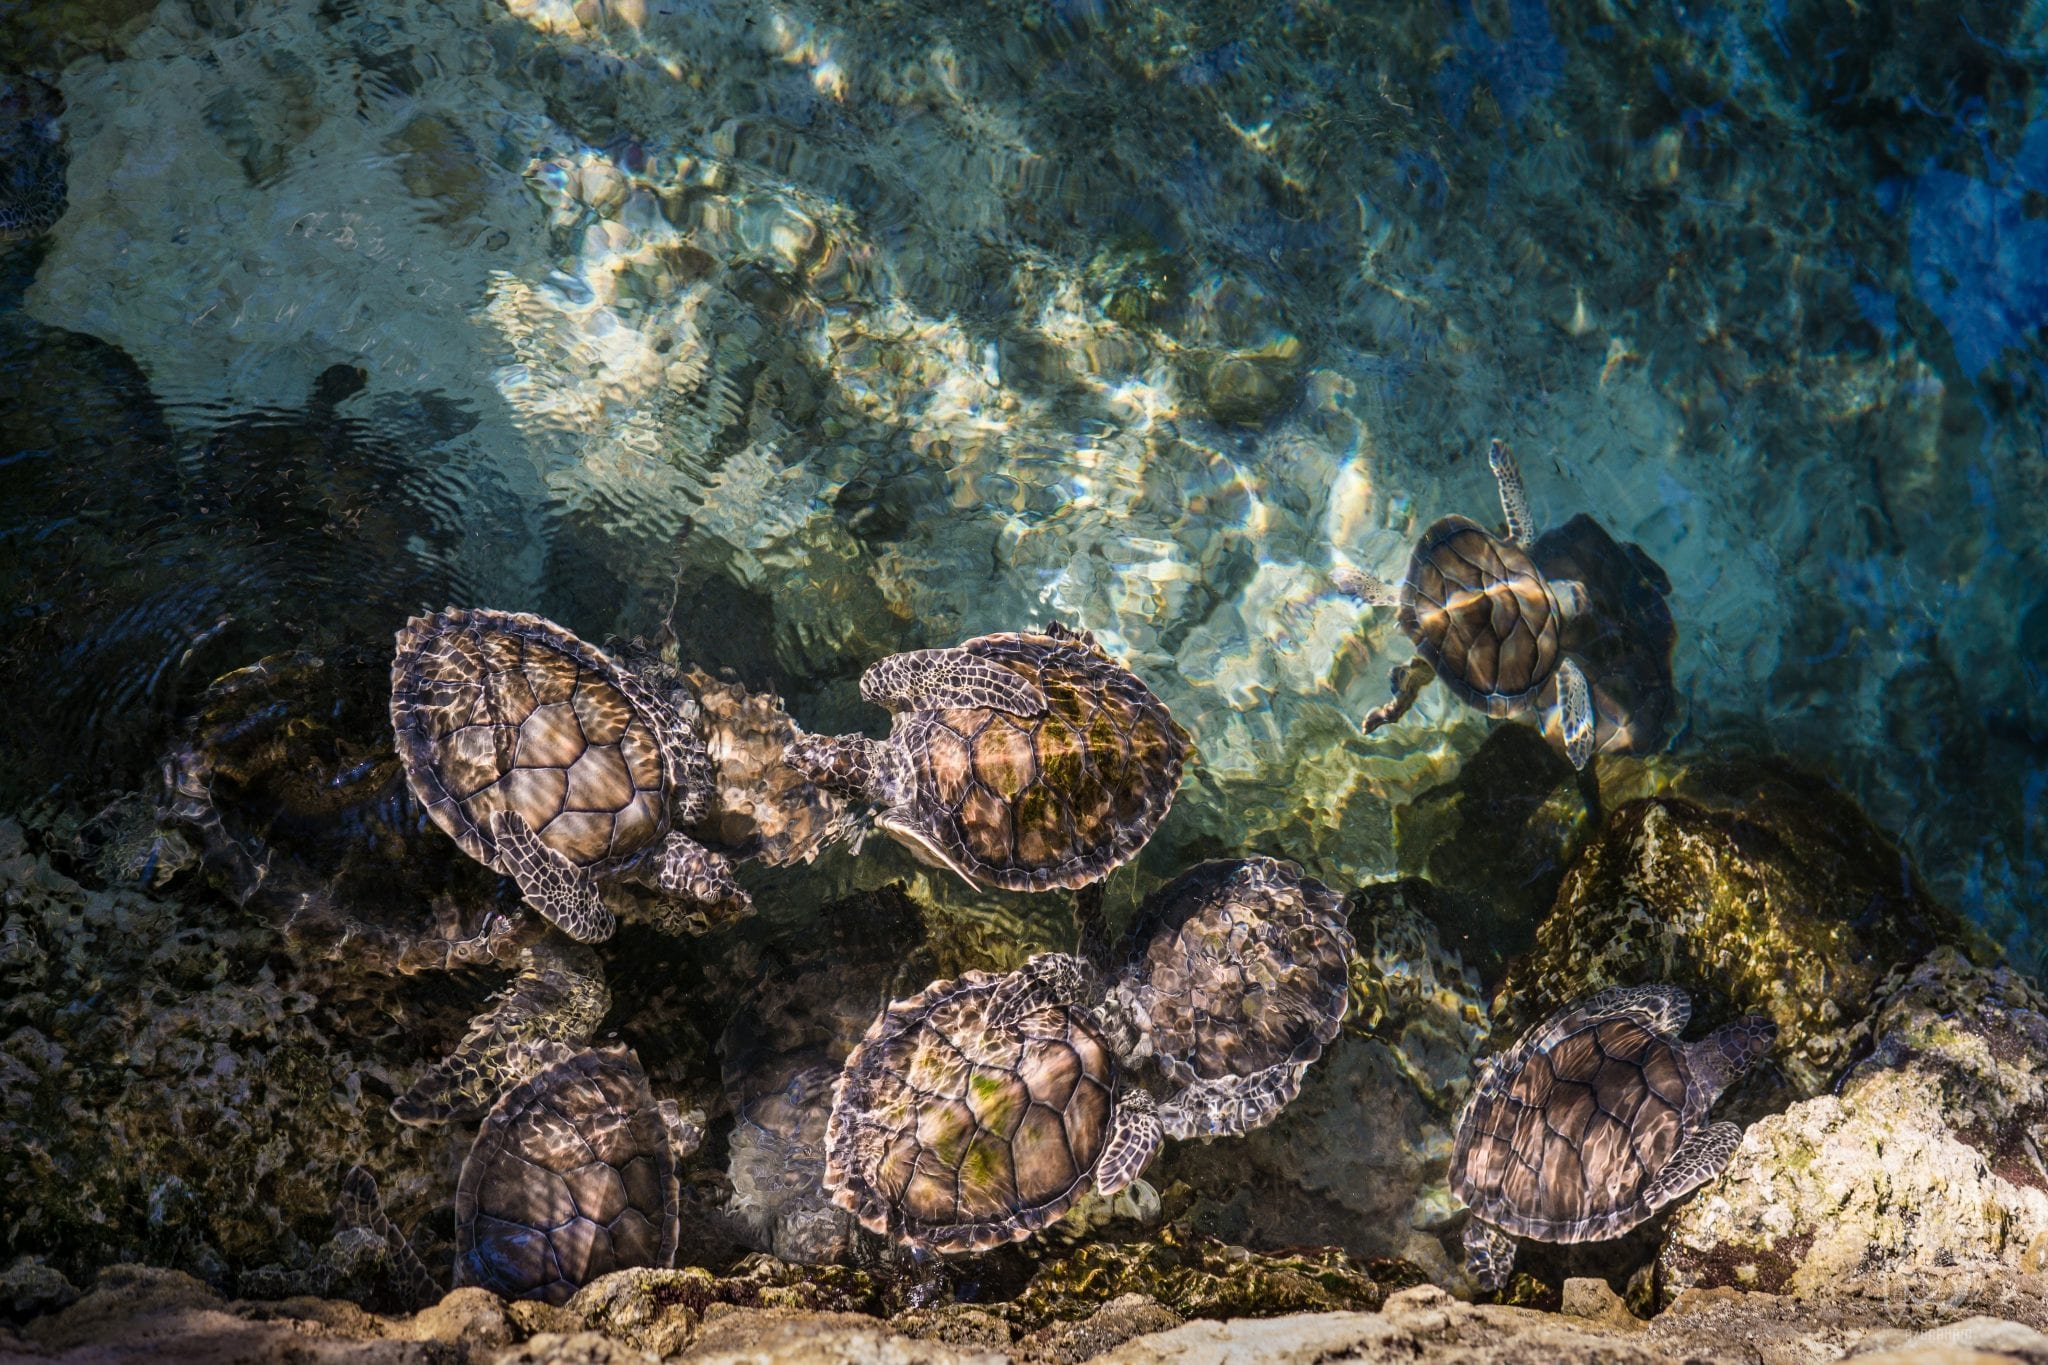 Scuba Diving in Africa ricardo braham